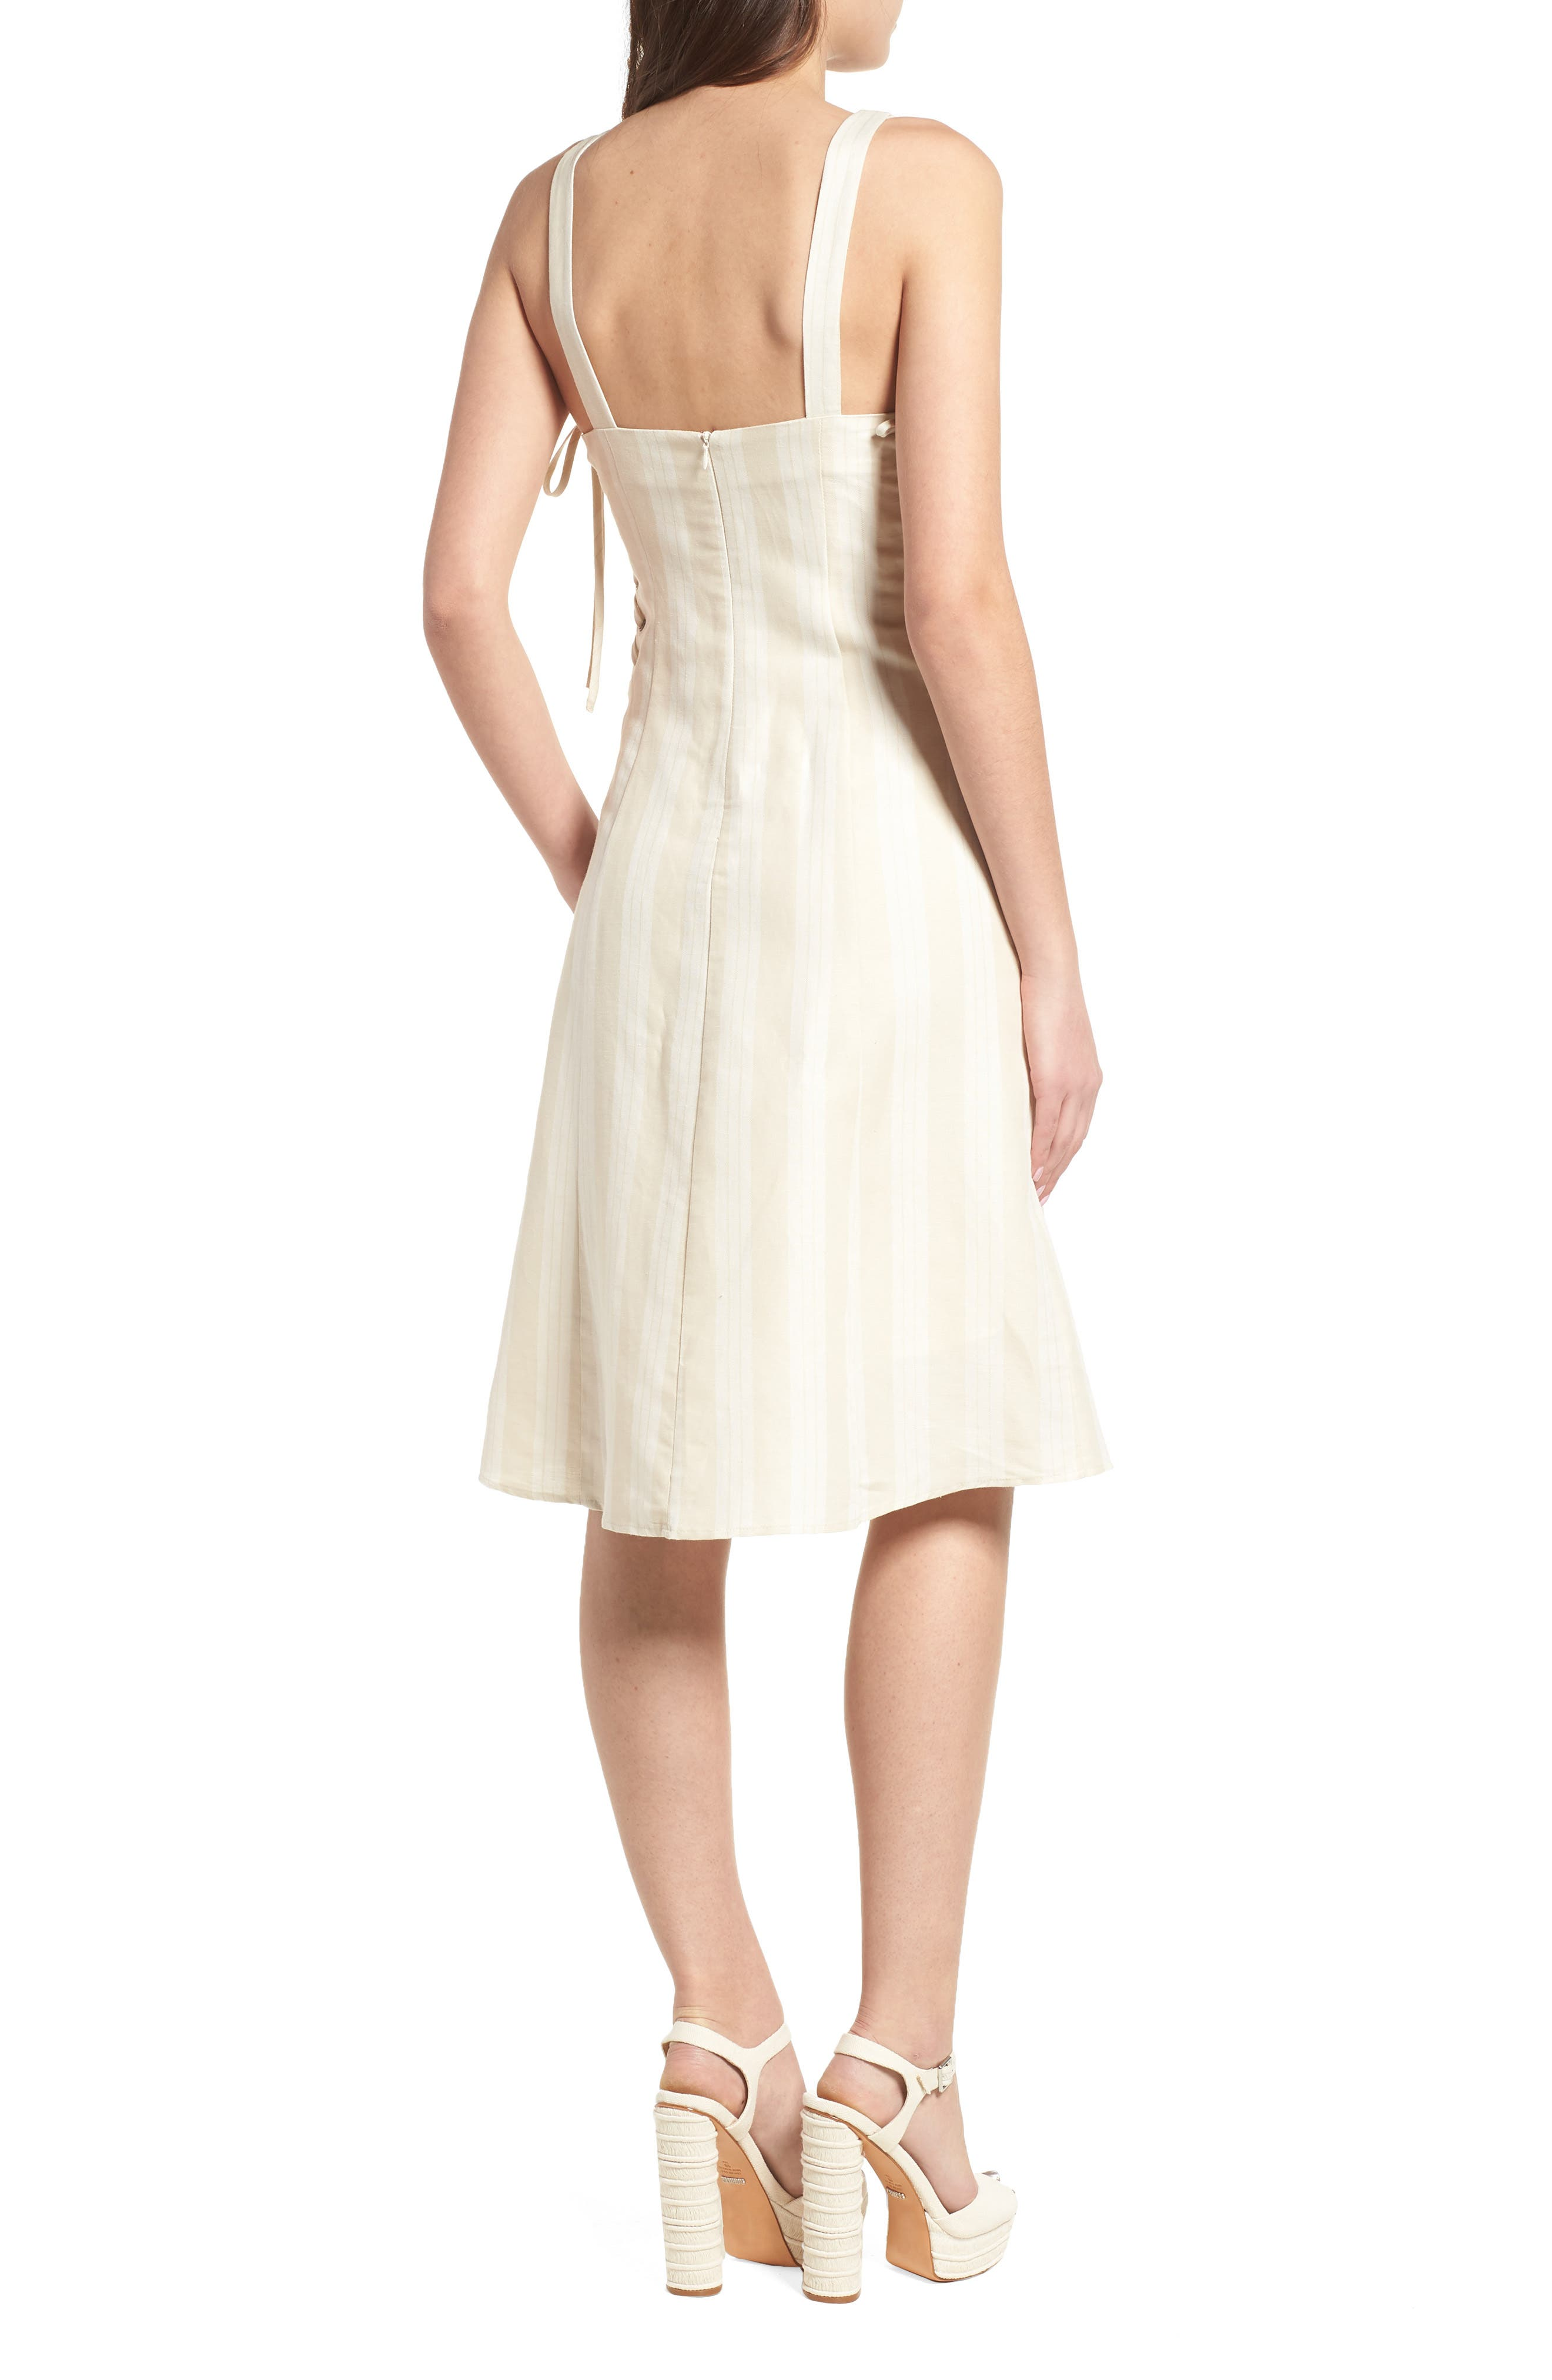 Elena Lace Side Dress,                             Alternate thumbnail 2, color,                             250